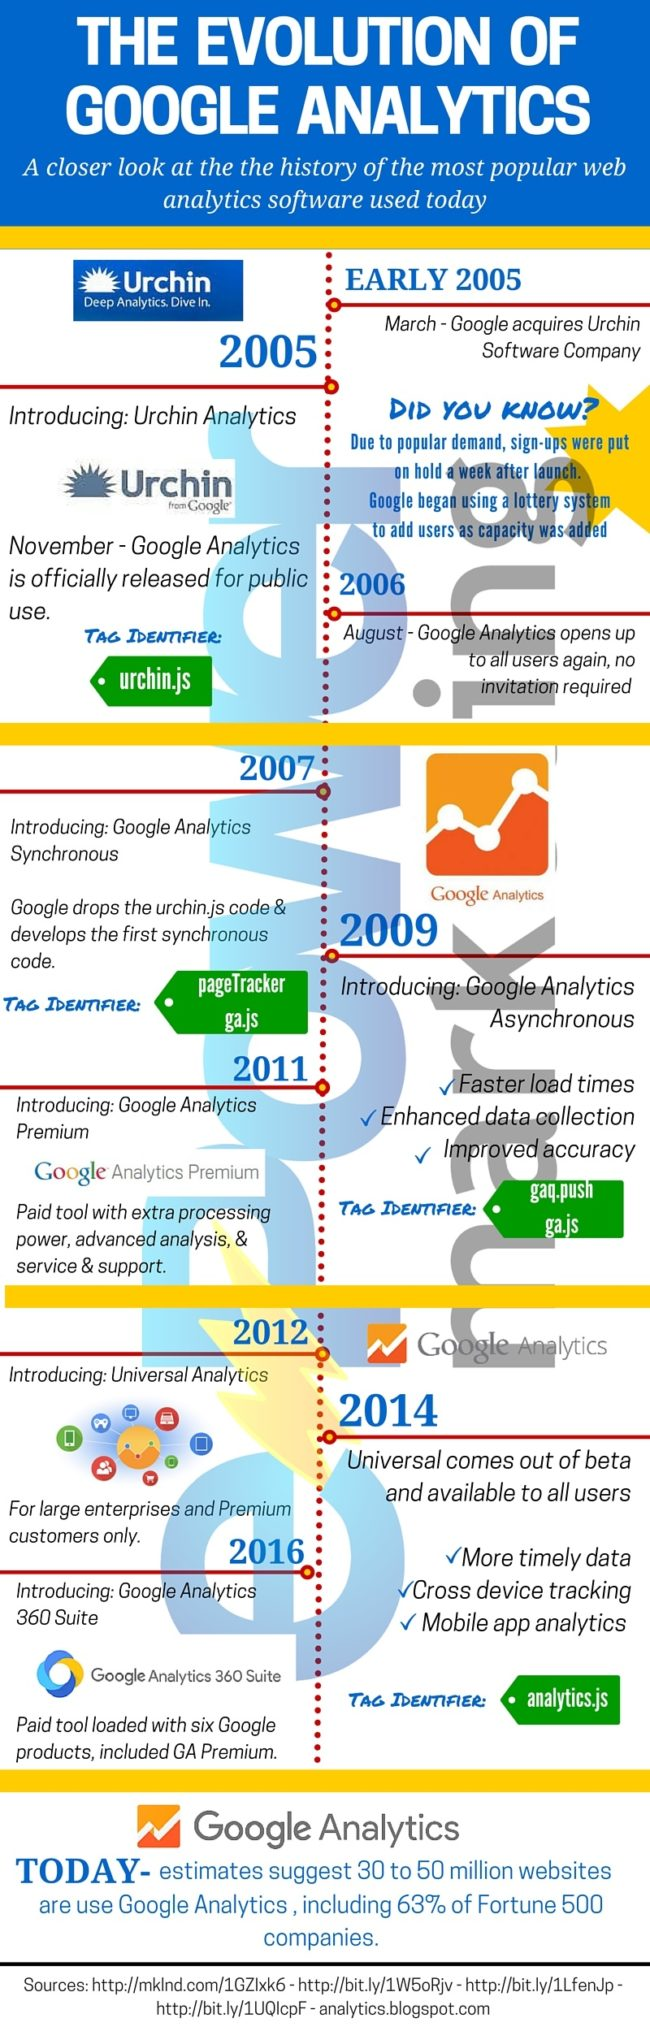 The Evolution of Google Analytics Infographic